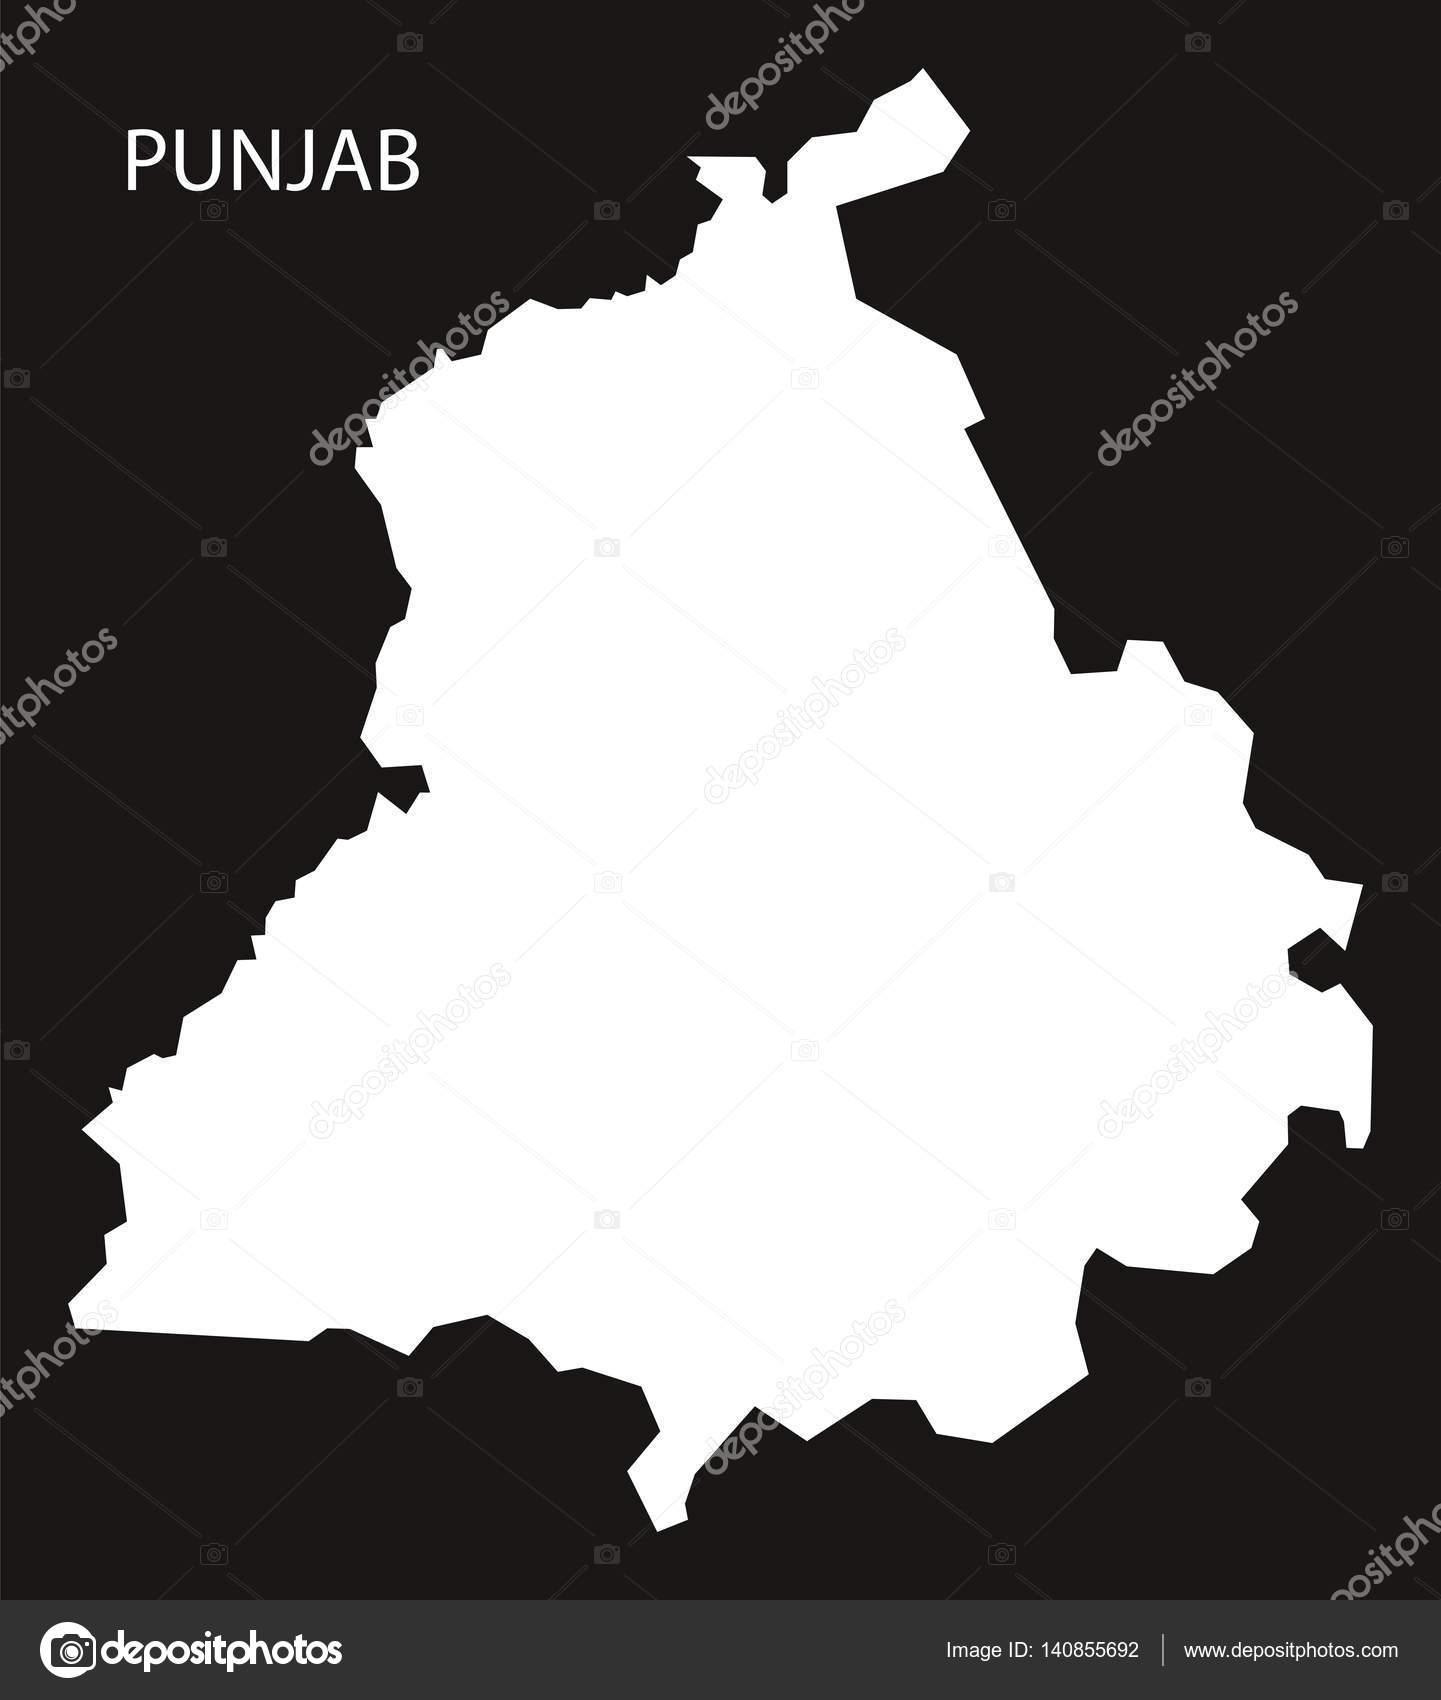 Carte Inde Punjab.Carte D Inde Punjab Noir Inverse Image Vectorielle